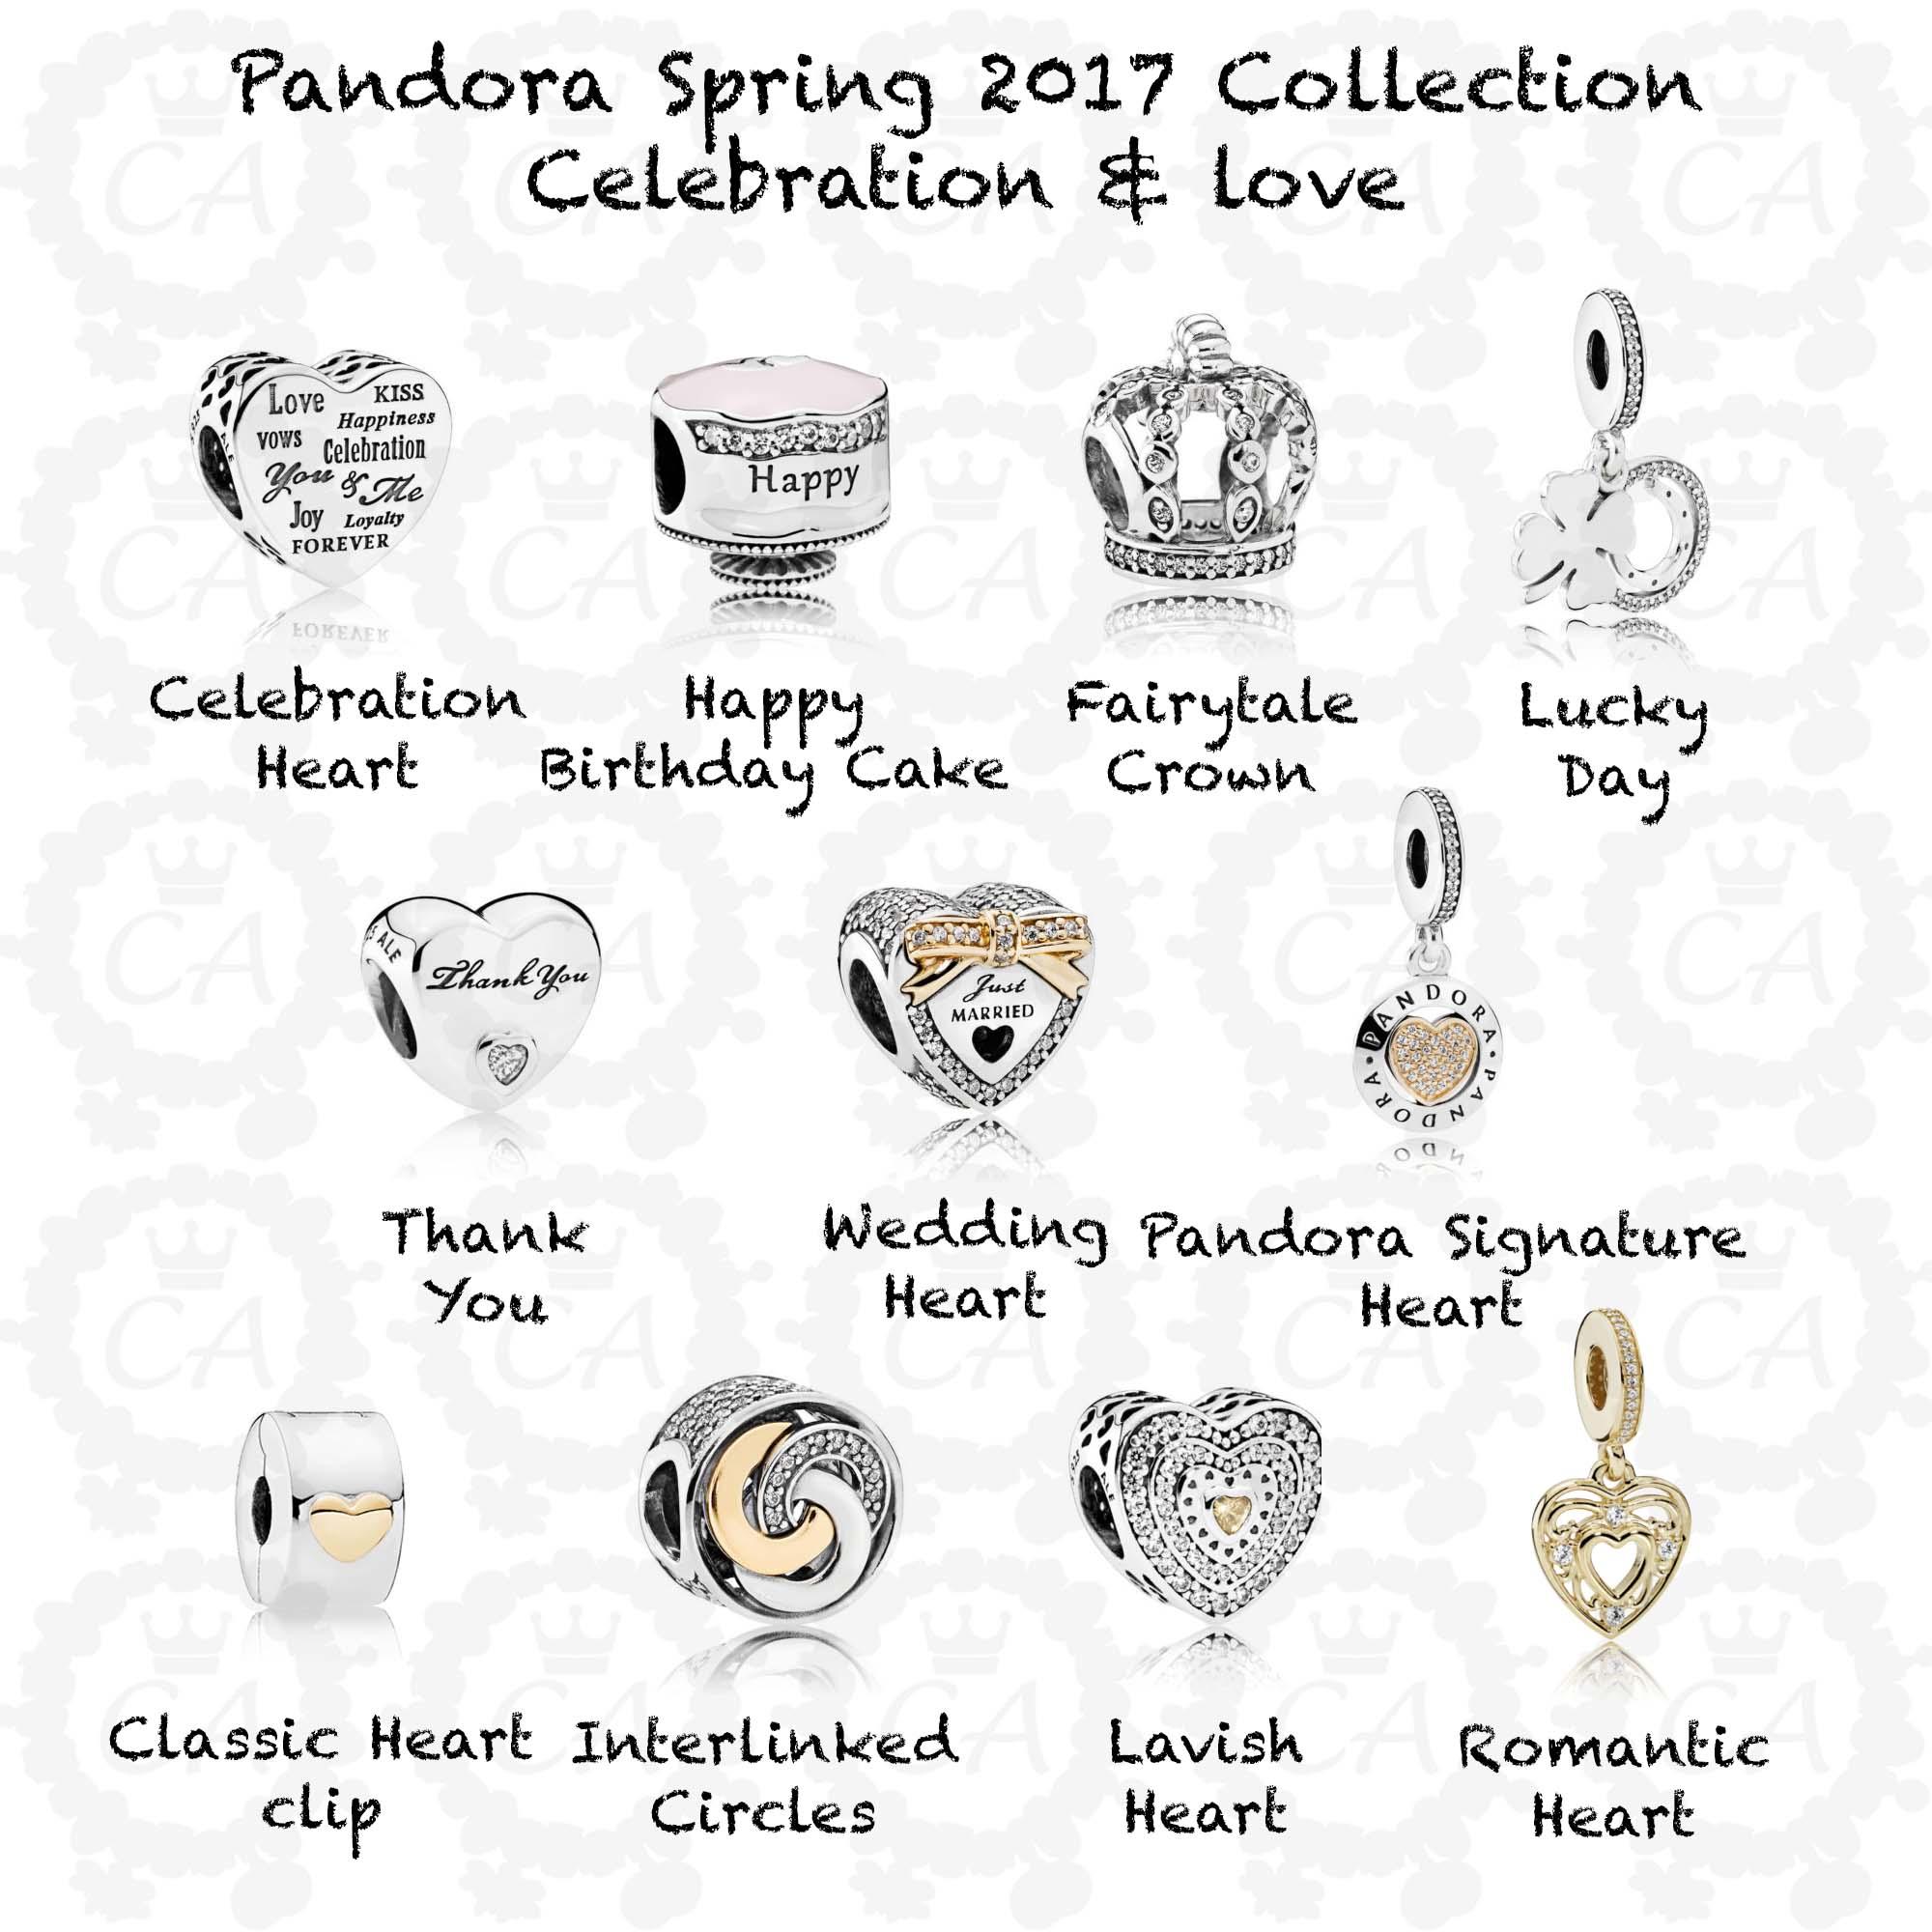 8ac393999ad cheap pandora spring 2017 celebration love 823b0 c0f8a